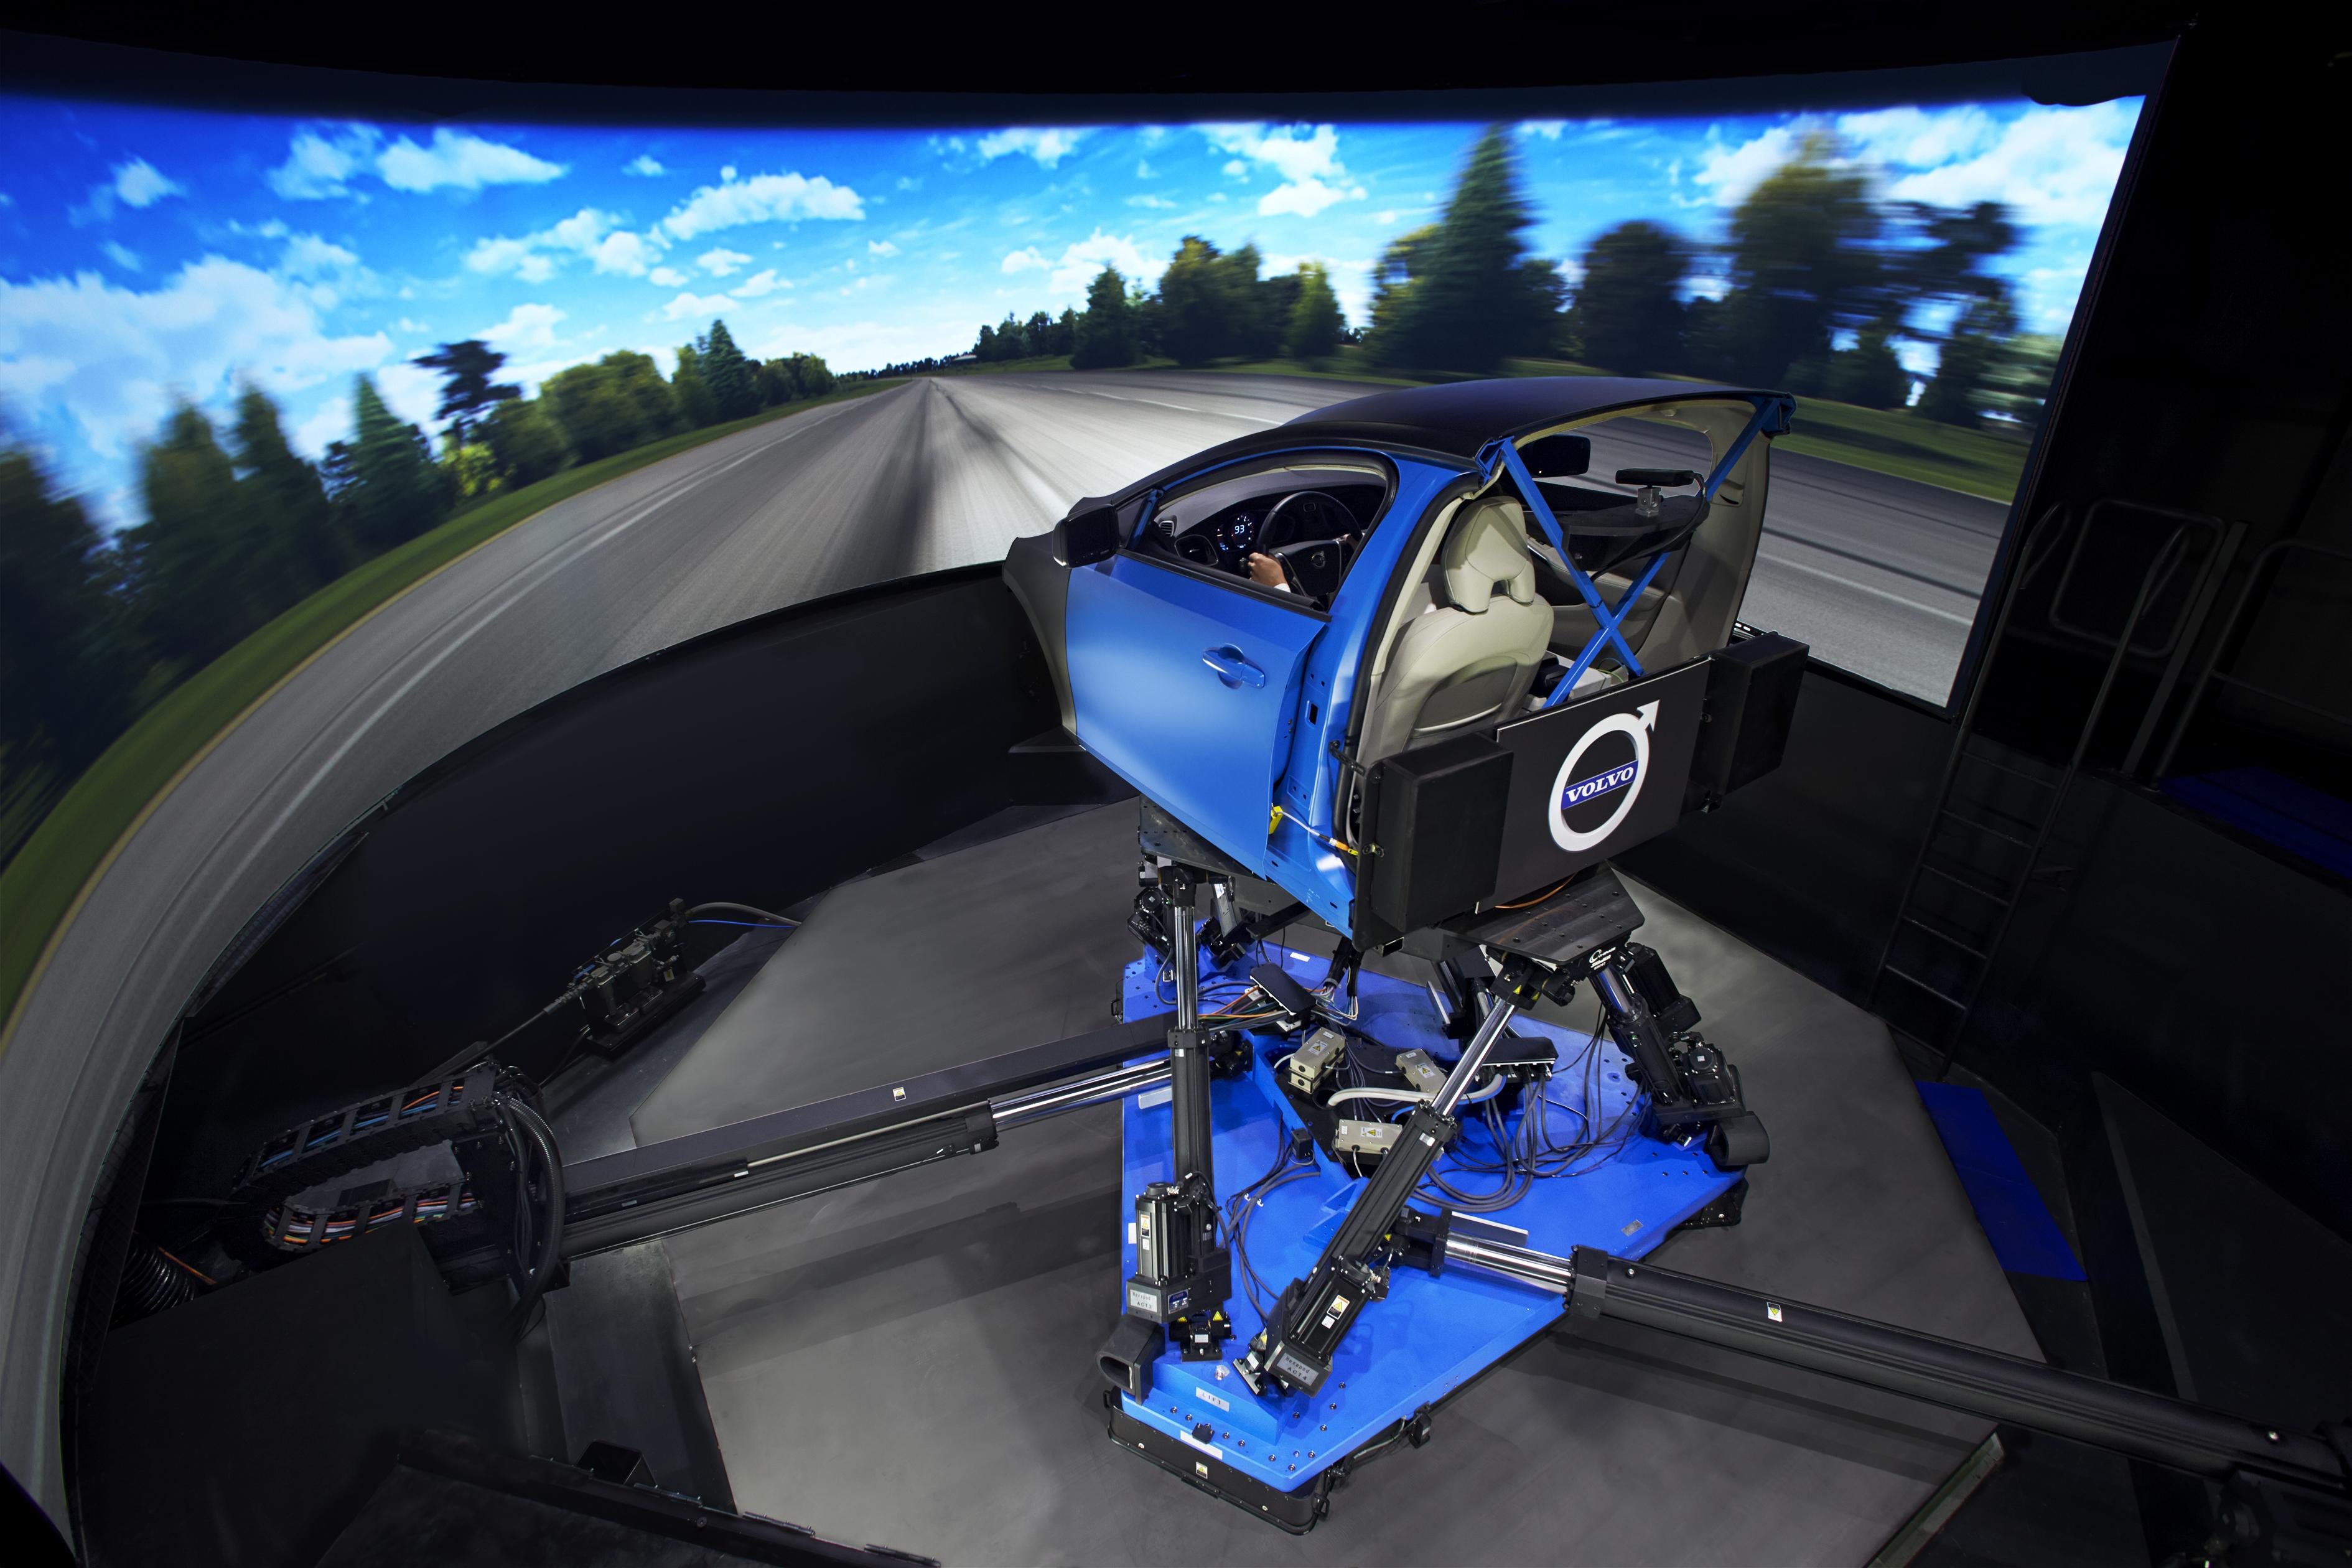 be1248eb4547 VI-grade successfully completes installation of DiM Driving Simulator at  Volvo Car Corporation